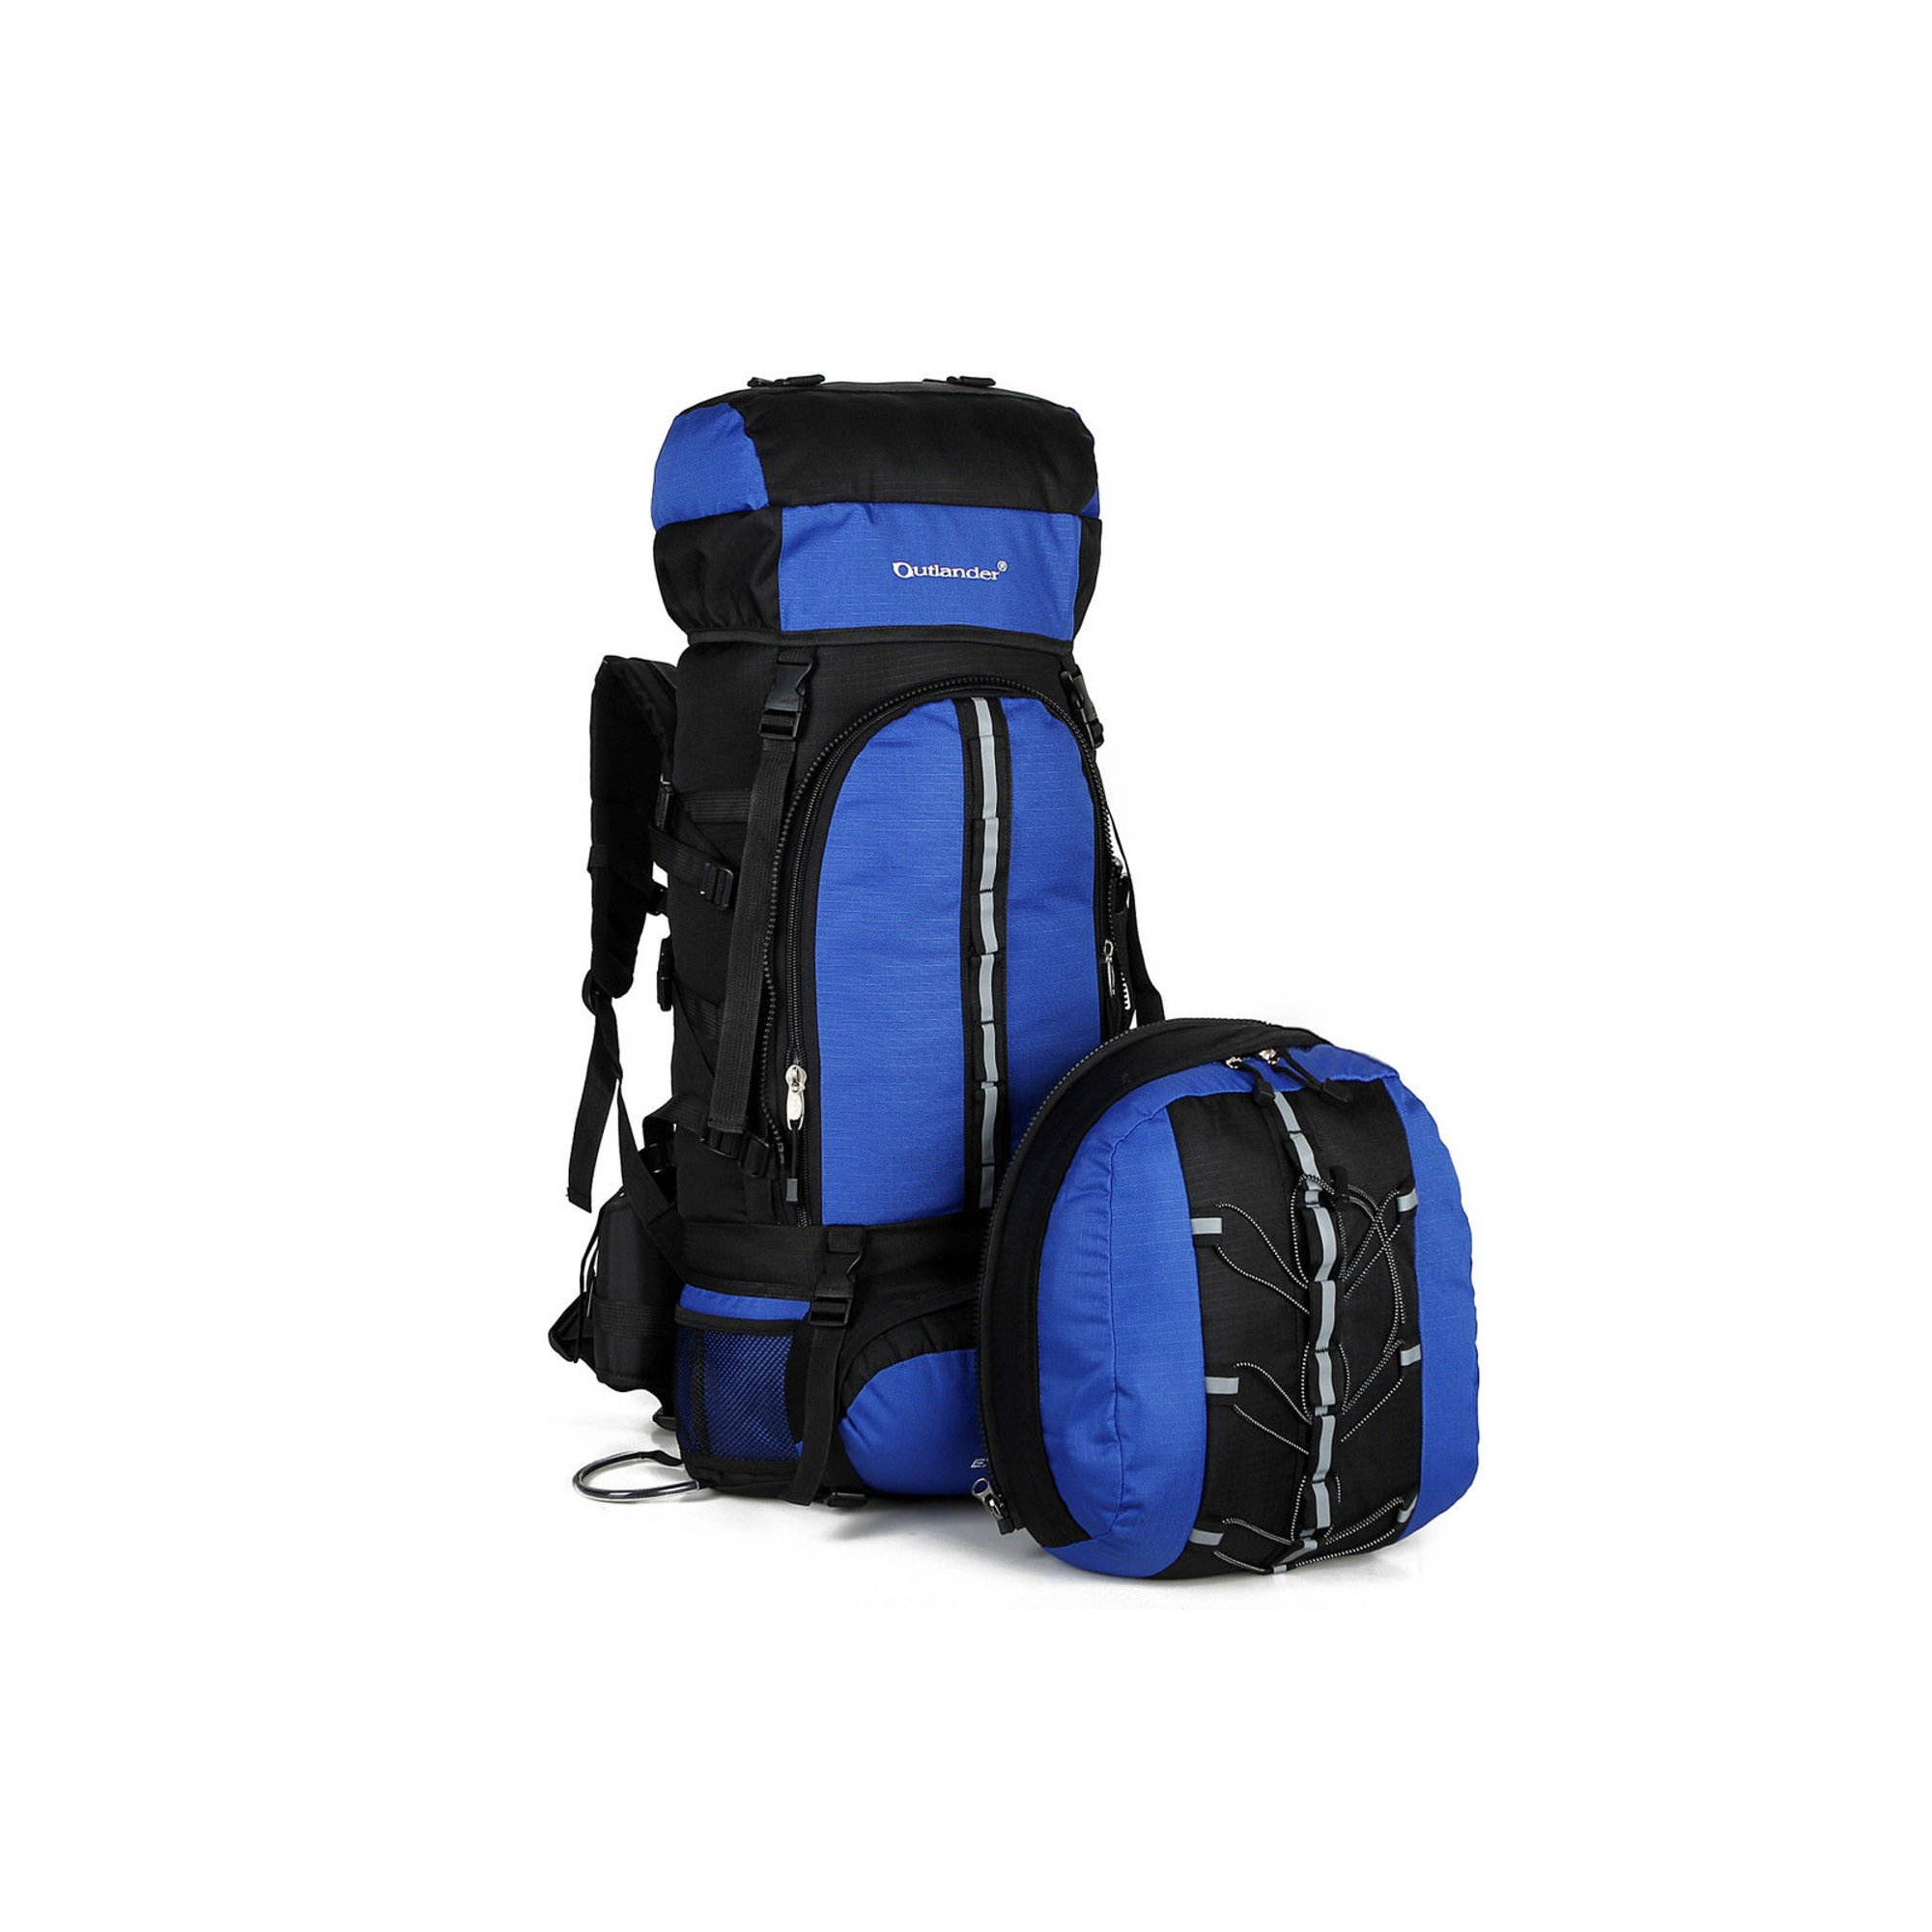 9940b9a347f1 Ktaxon Outlander-2453 Hiking Backpack, 70L+10L Capacity, 600D Dual ...